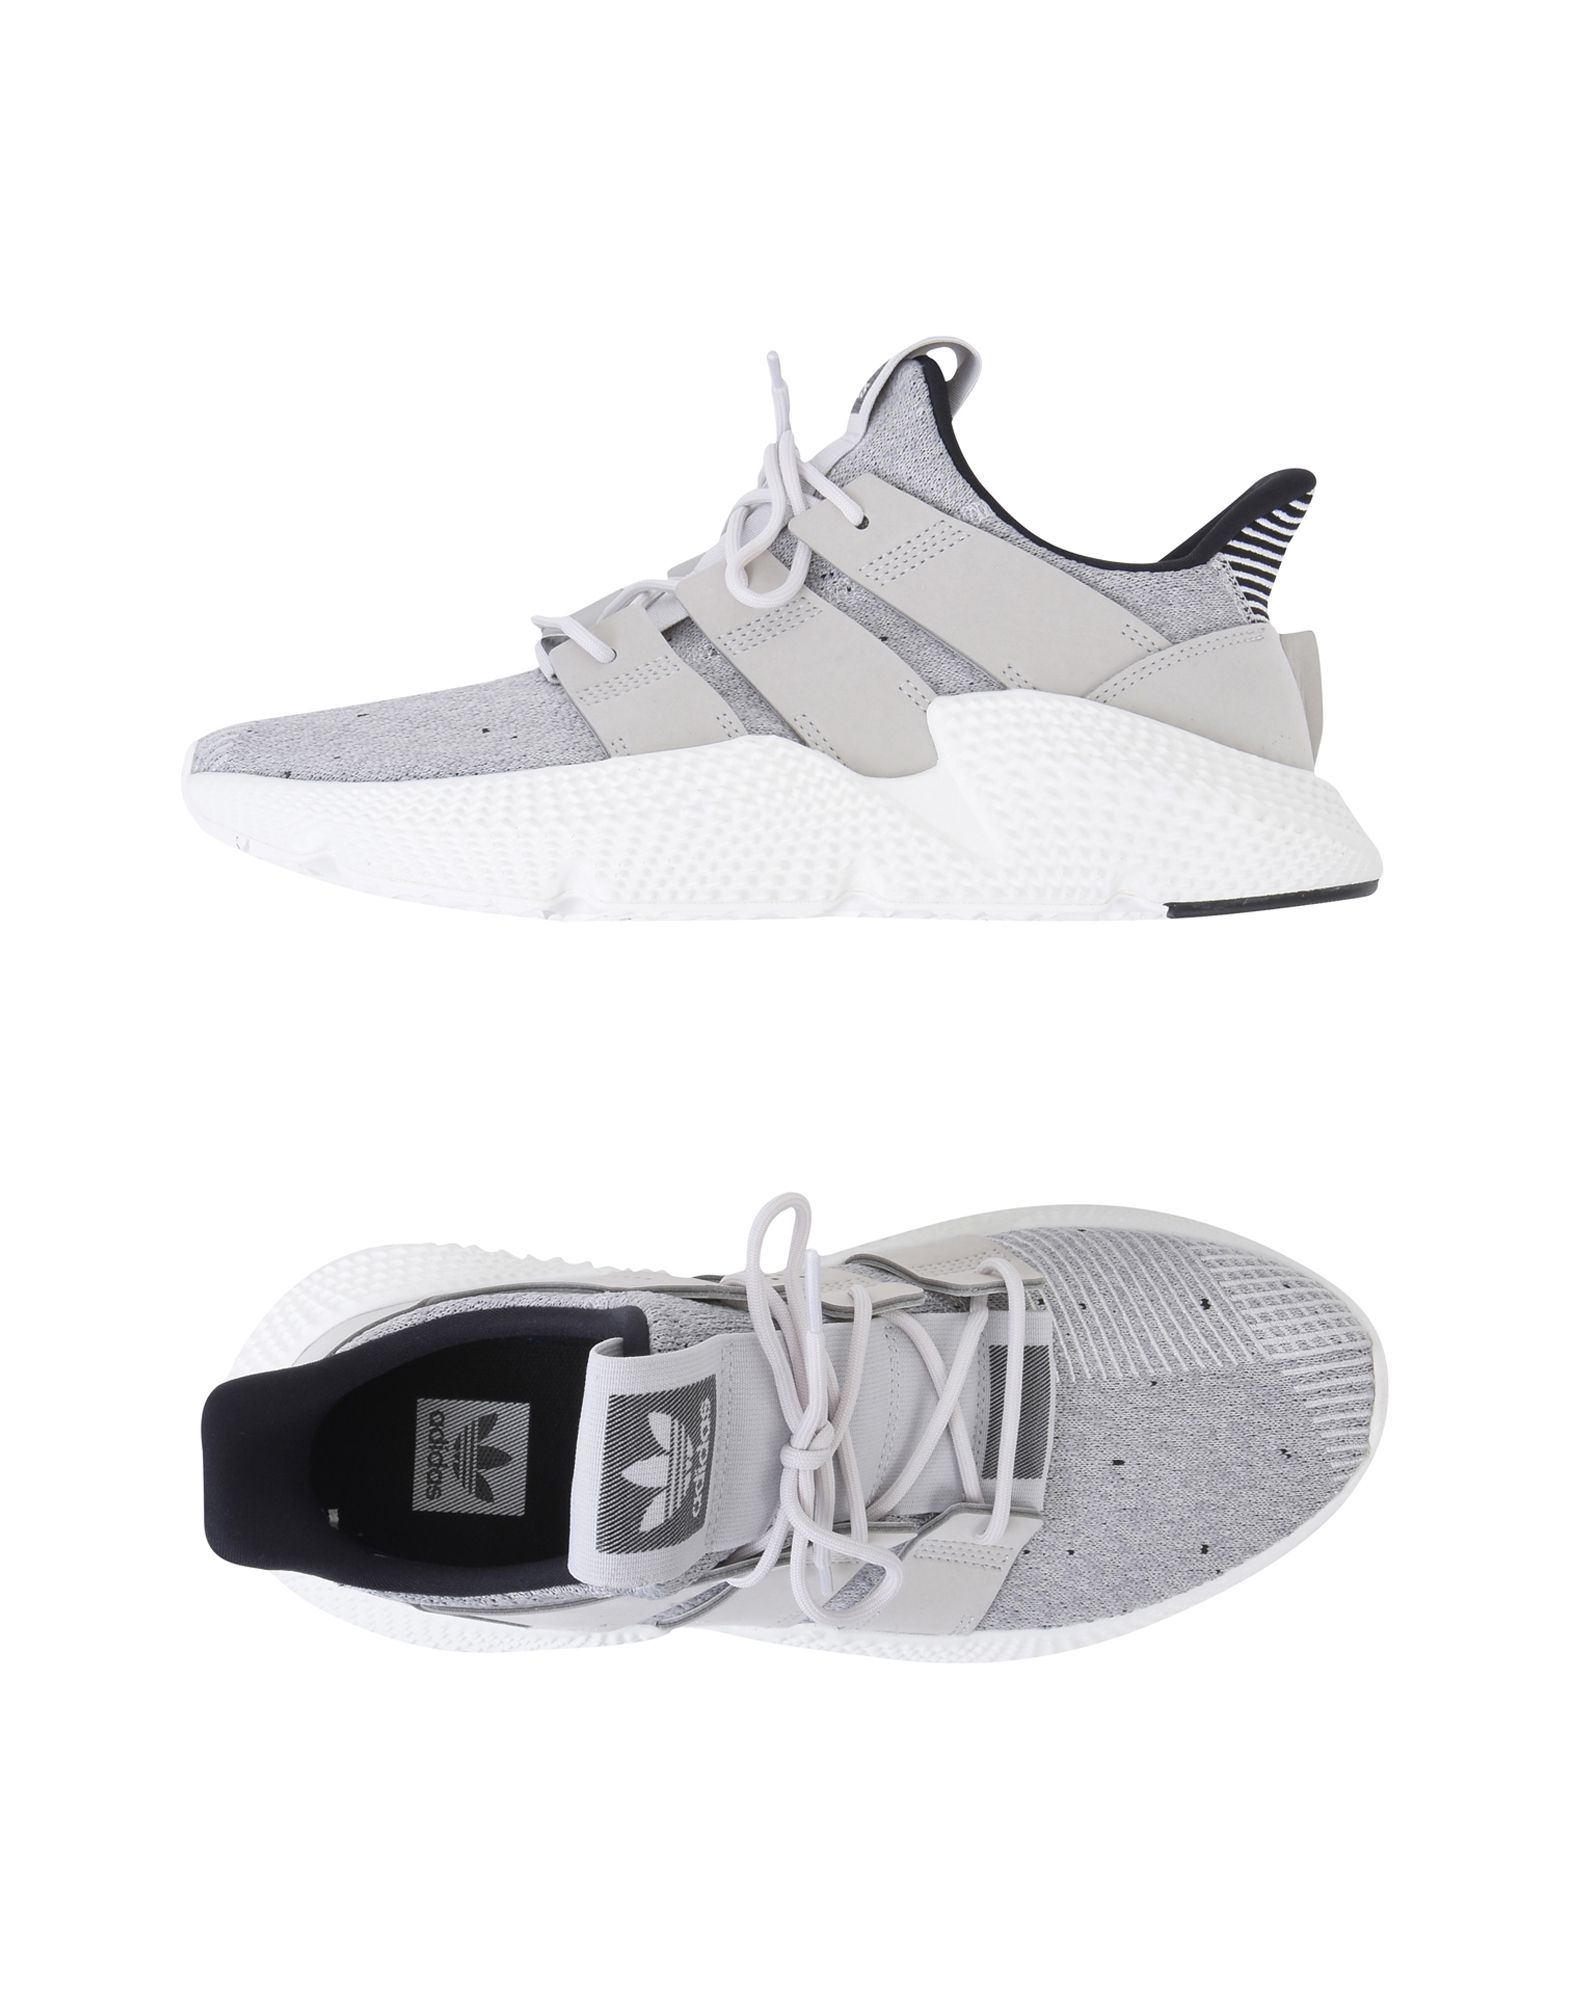 11533548JA Adidas Originals Prophere  11533548JA  Heiße Schuhe 3acd6b